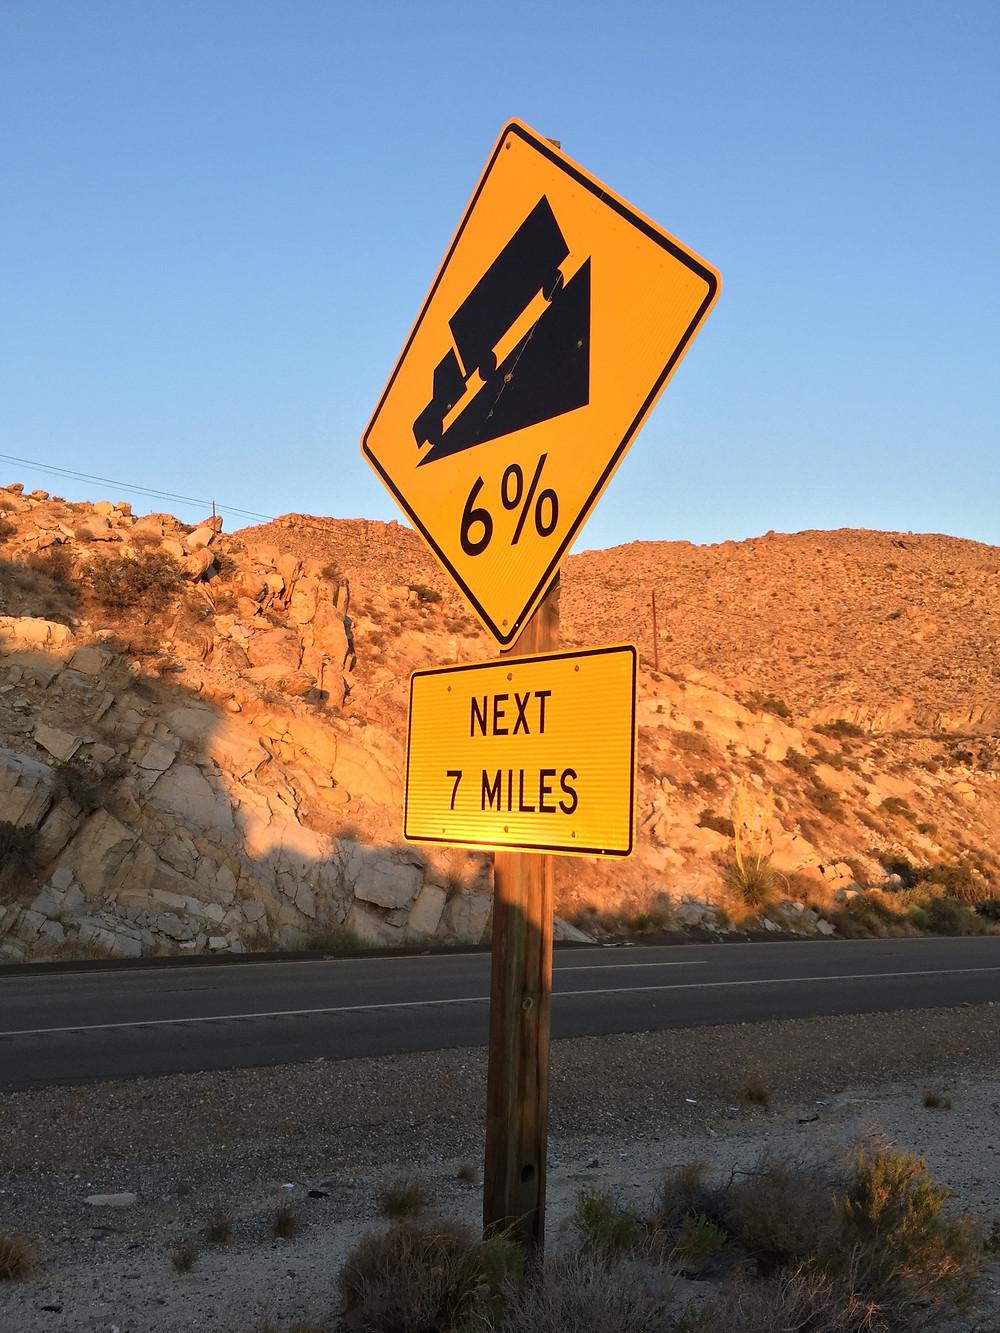 Steep Grade Warning Sign